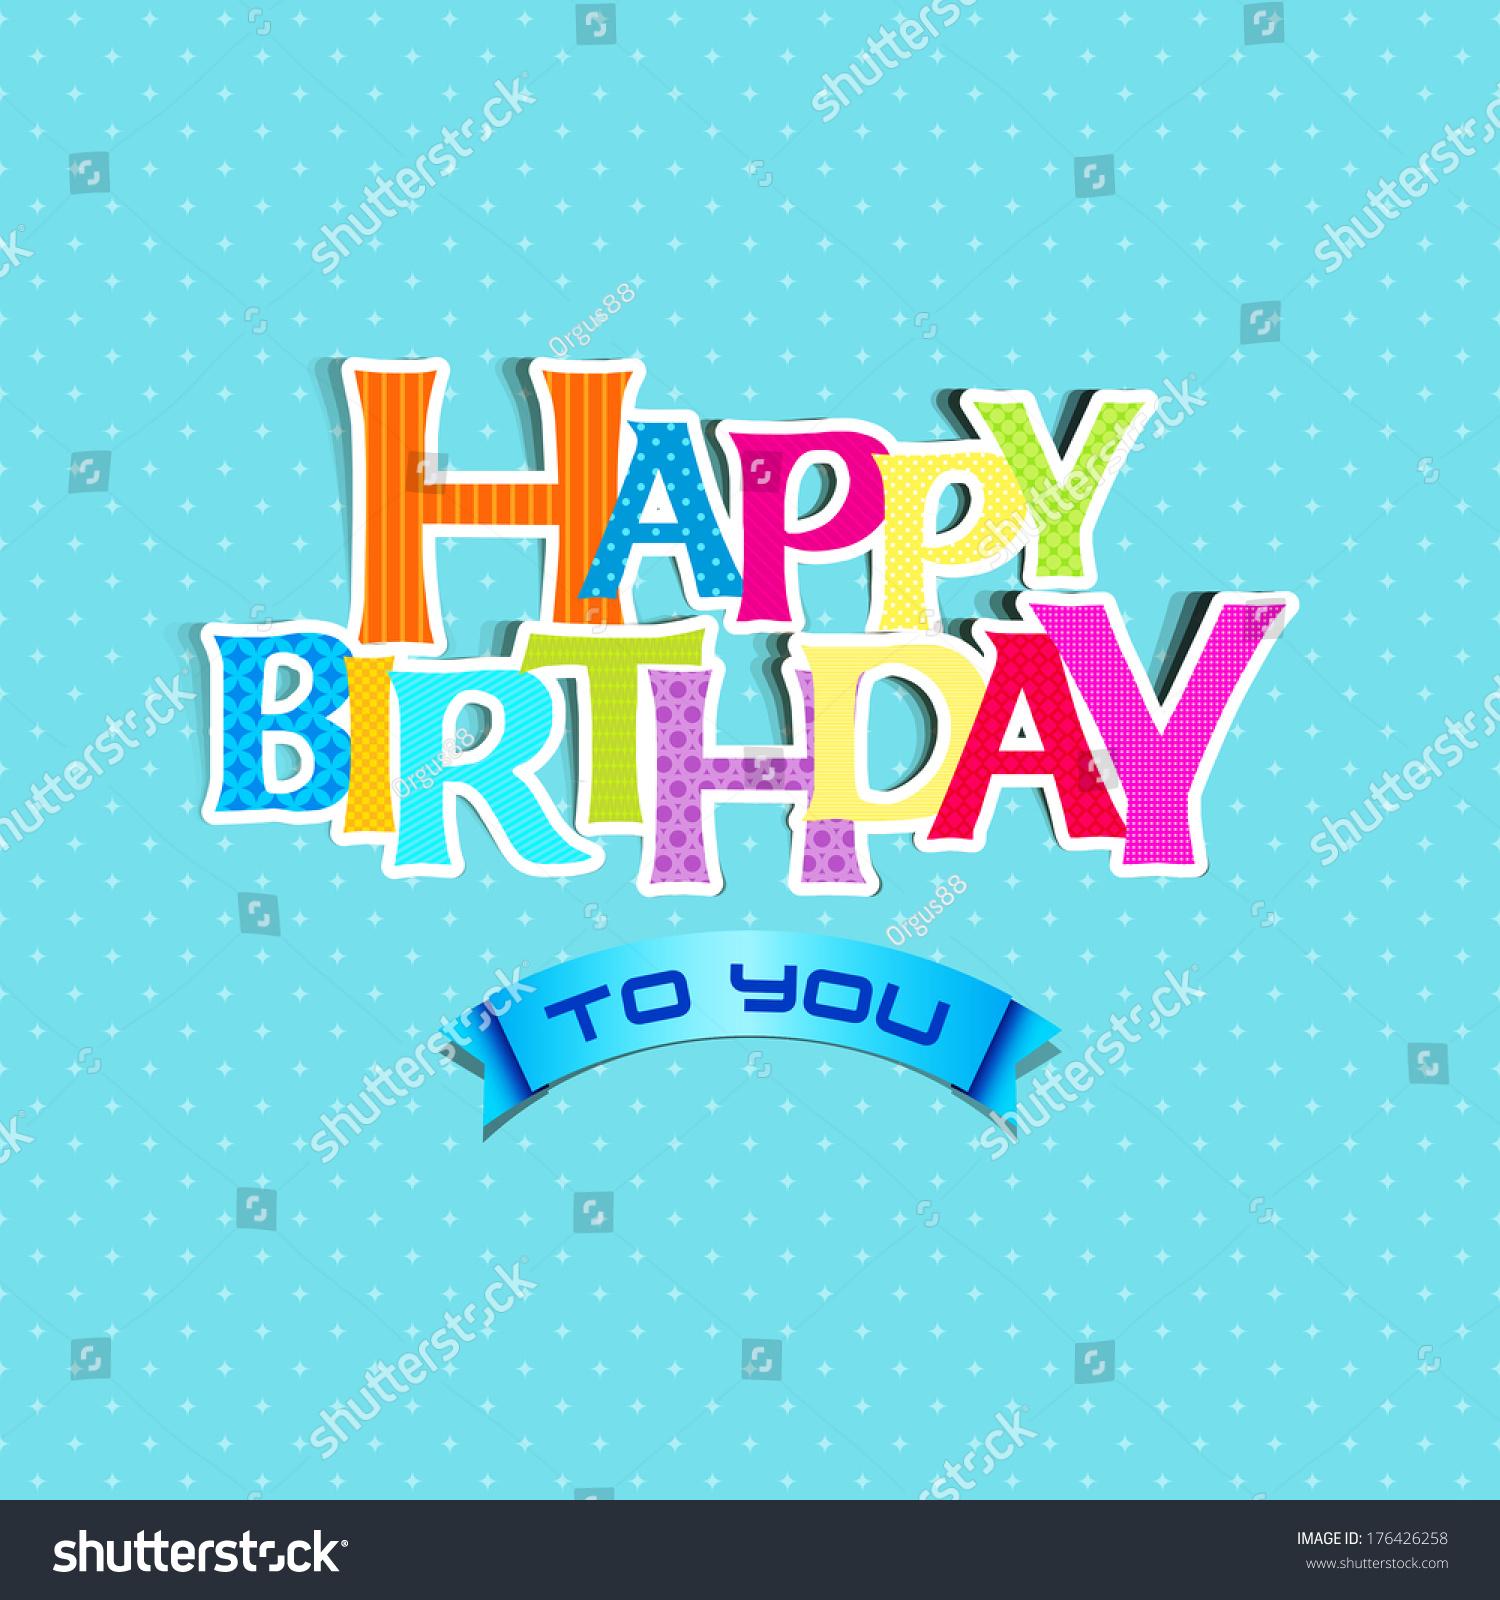 Happy Birthday Card Vintage Choice Image Free Birthday Cards